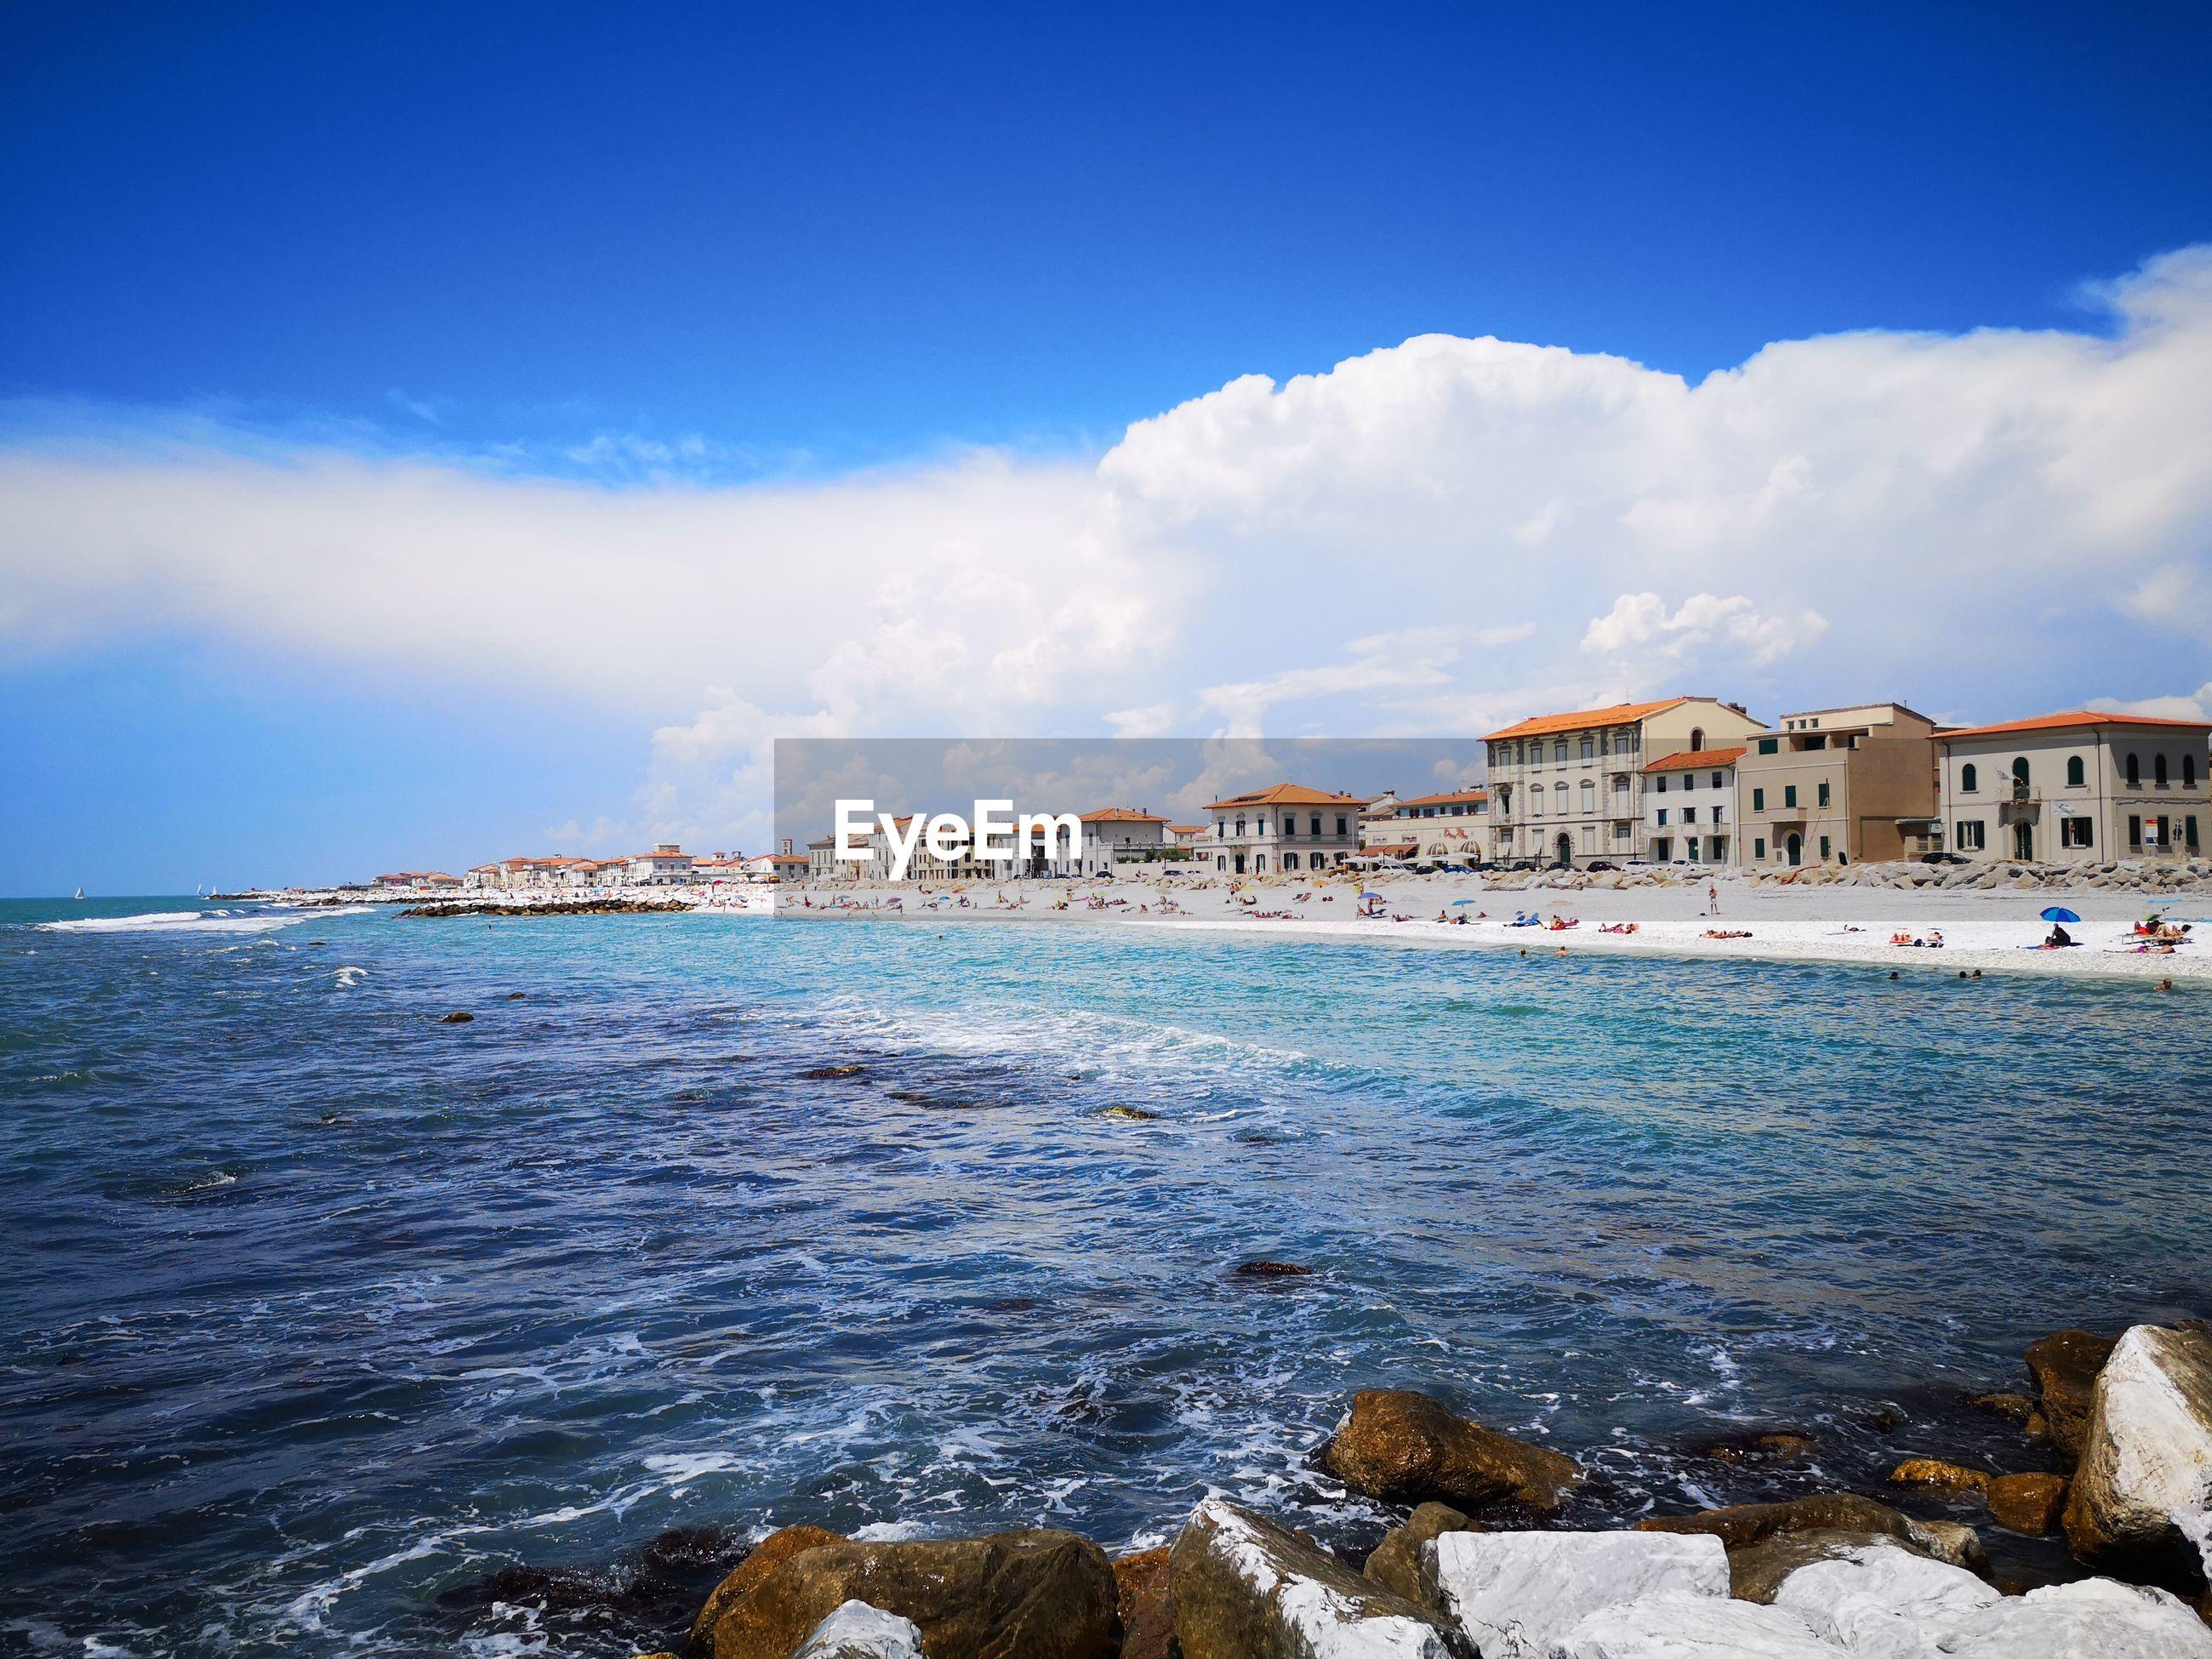 SEA AND BUILDINGS AGAINST SKY